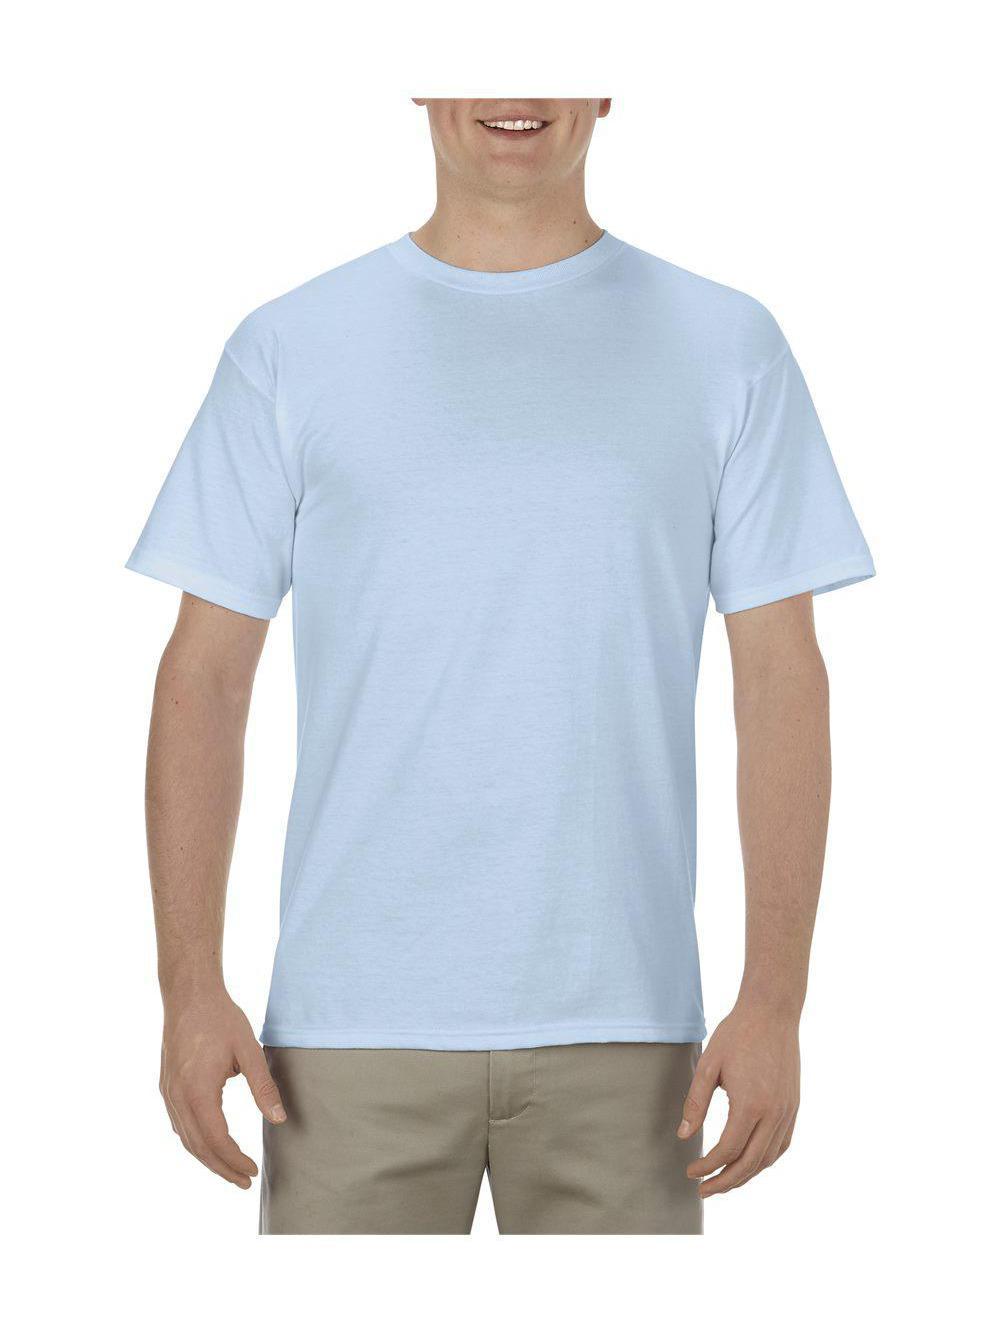 ALSTYLE-Premium-T-Shirt-1701 thumbnail 40